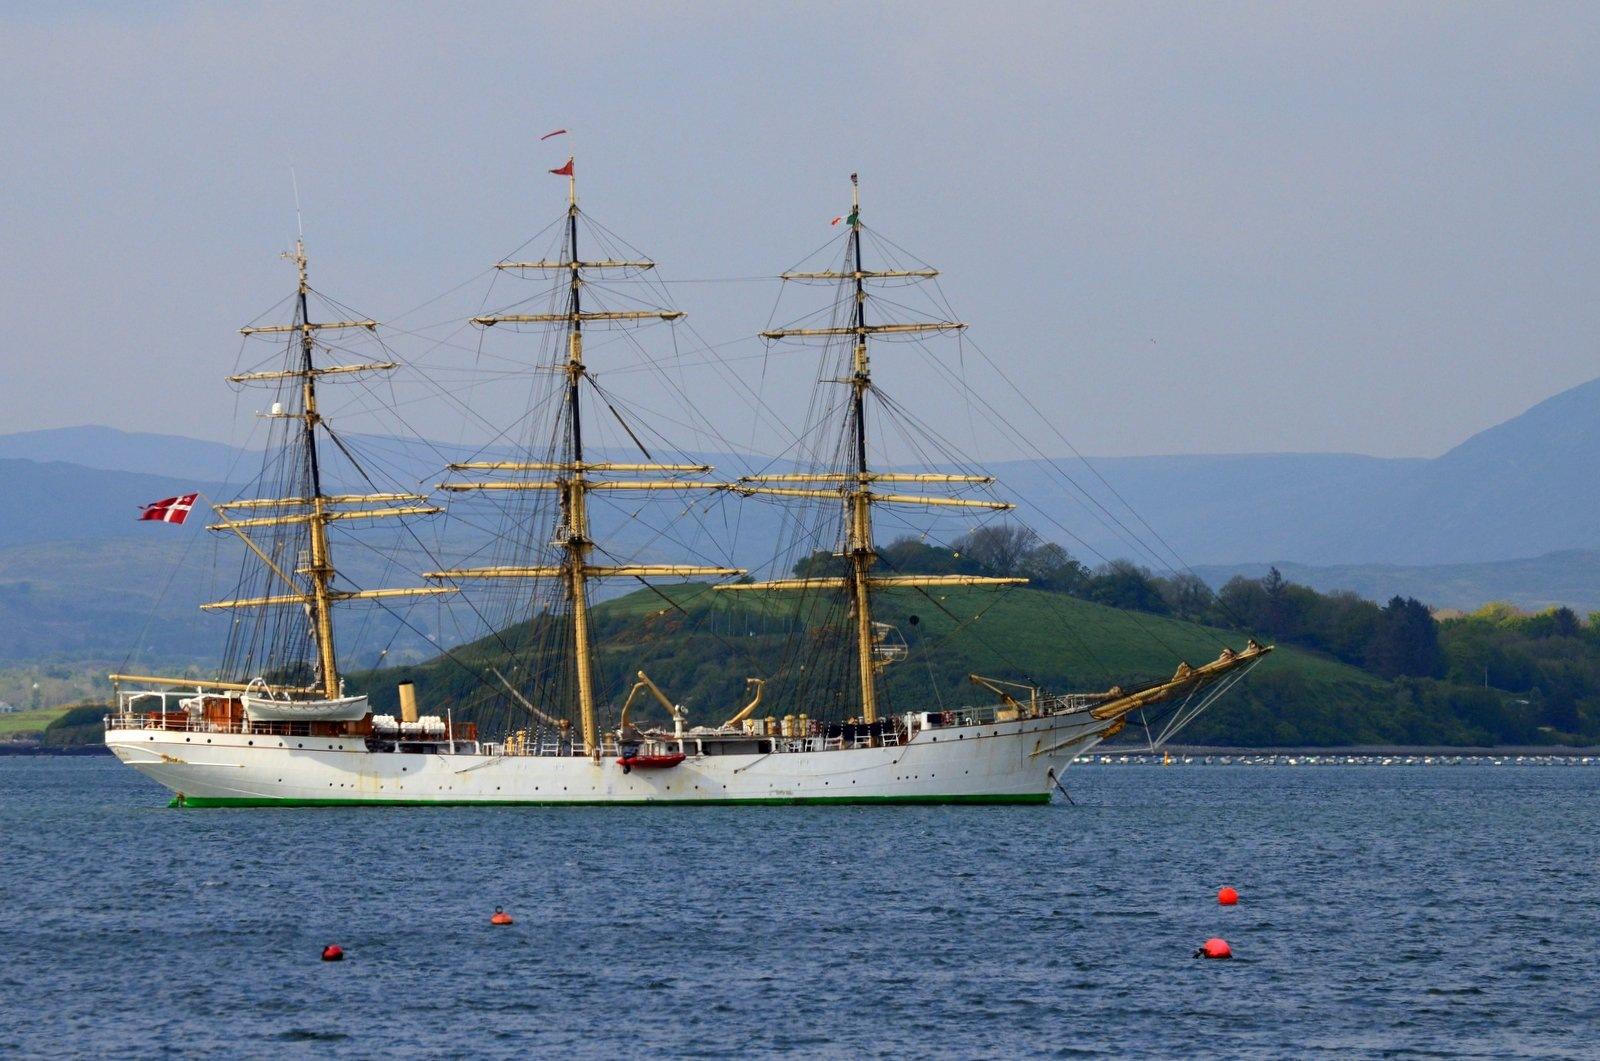 Danish Tall Ship in Bantry Bay. by jeffdixon